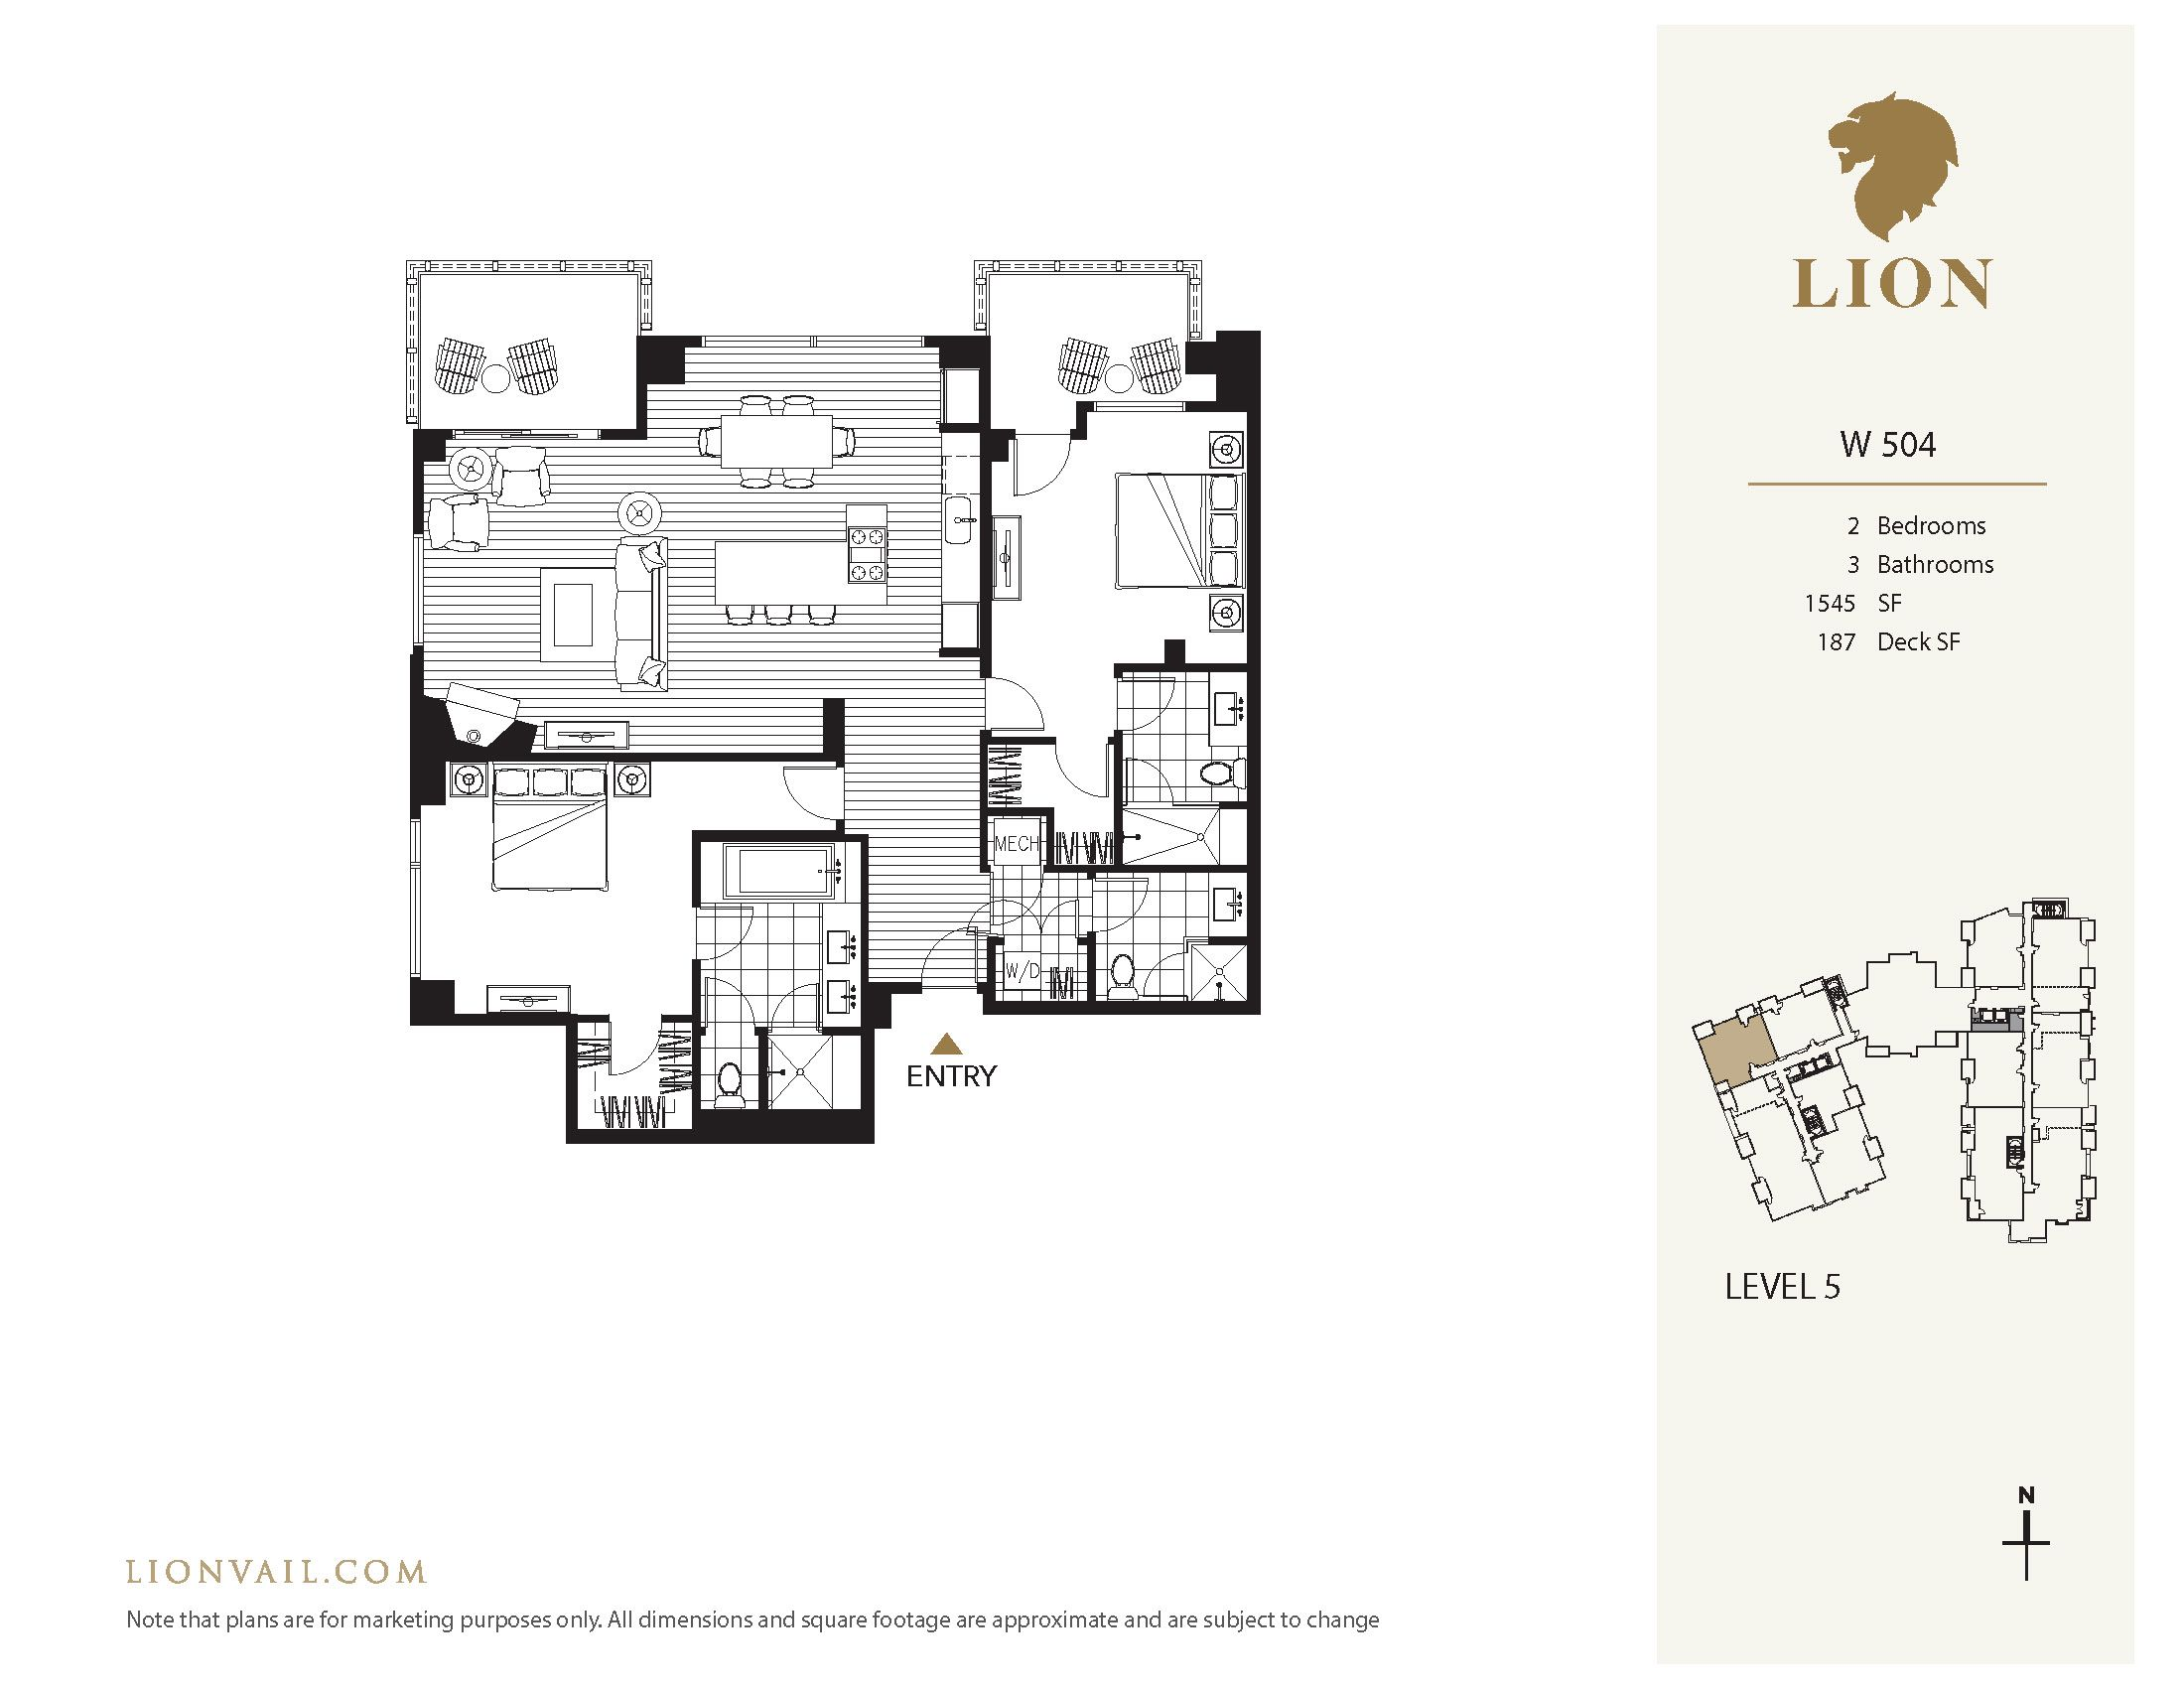 701 West Lionshead Circle - W504 Vail, CO 81657